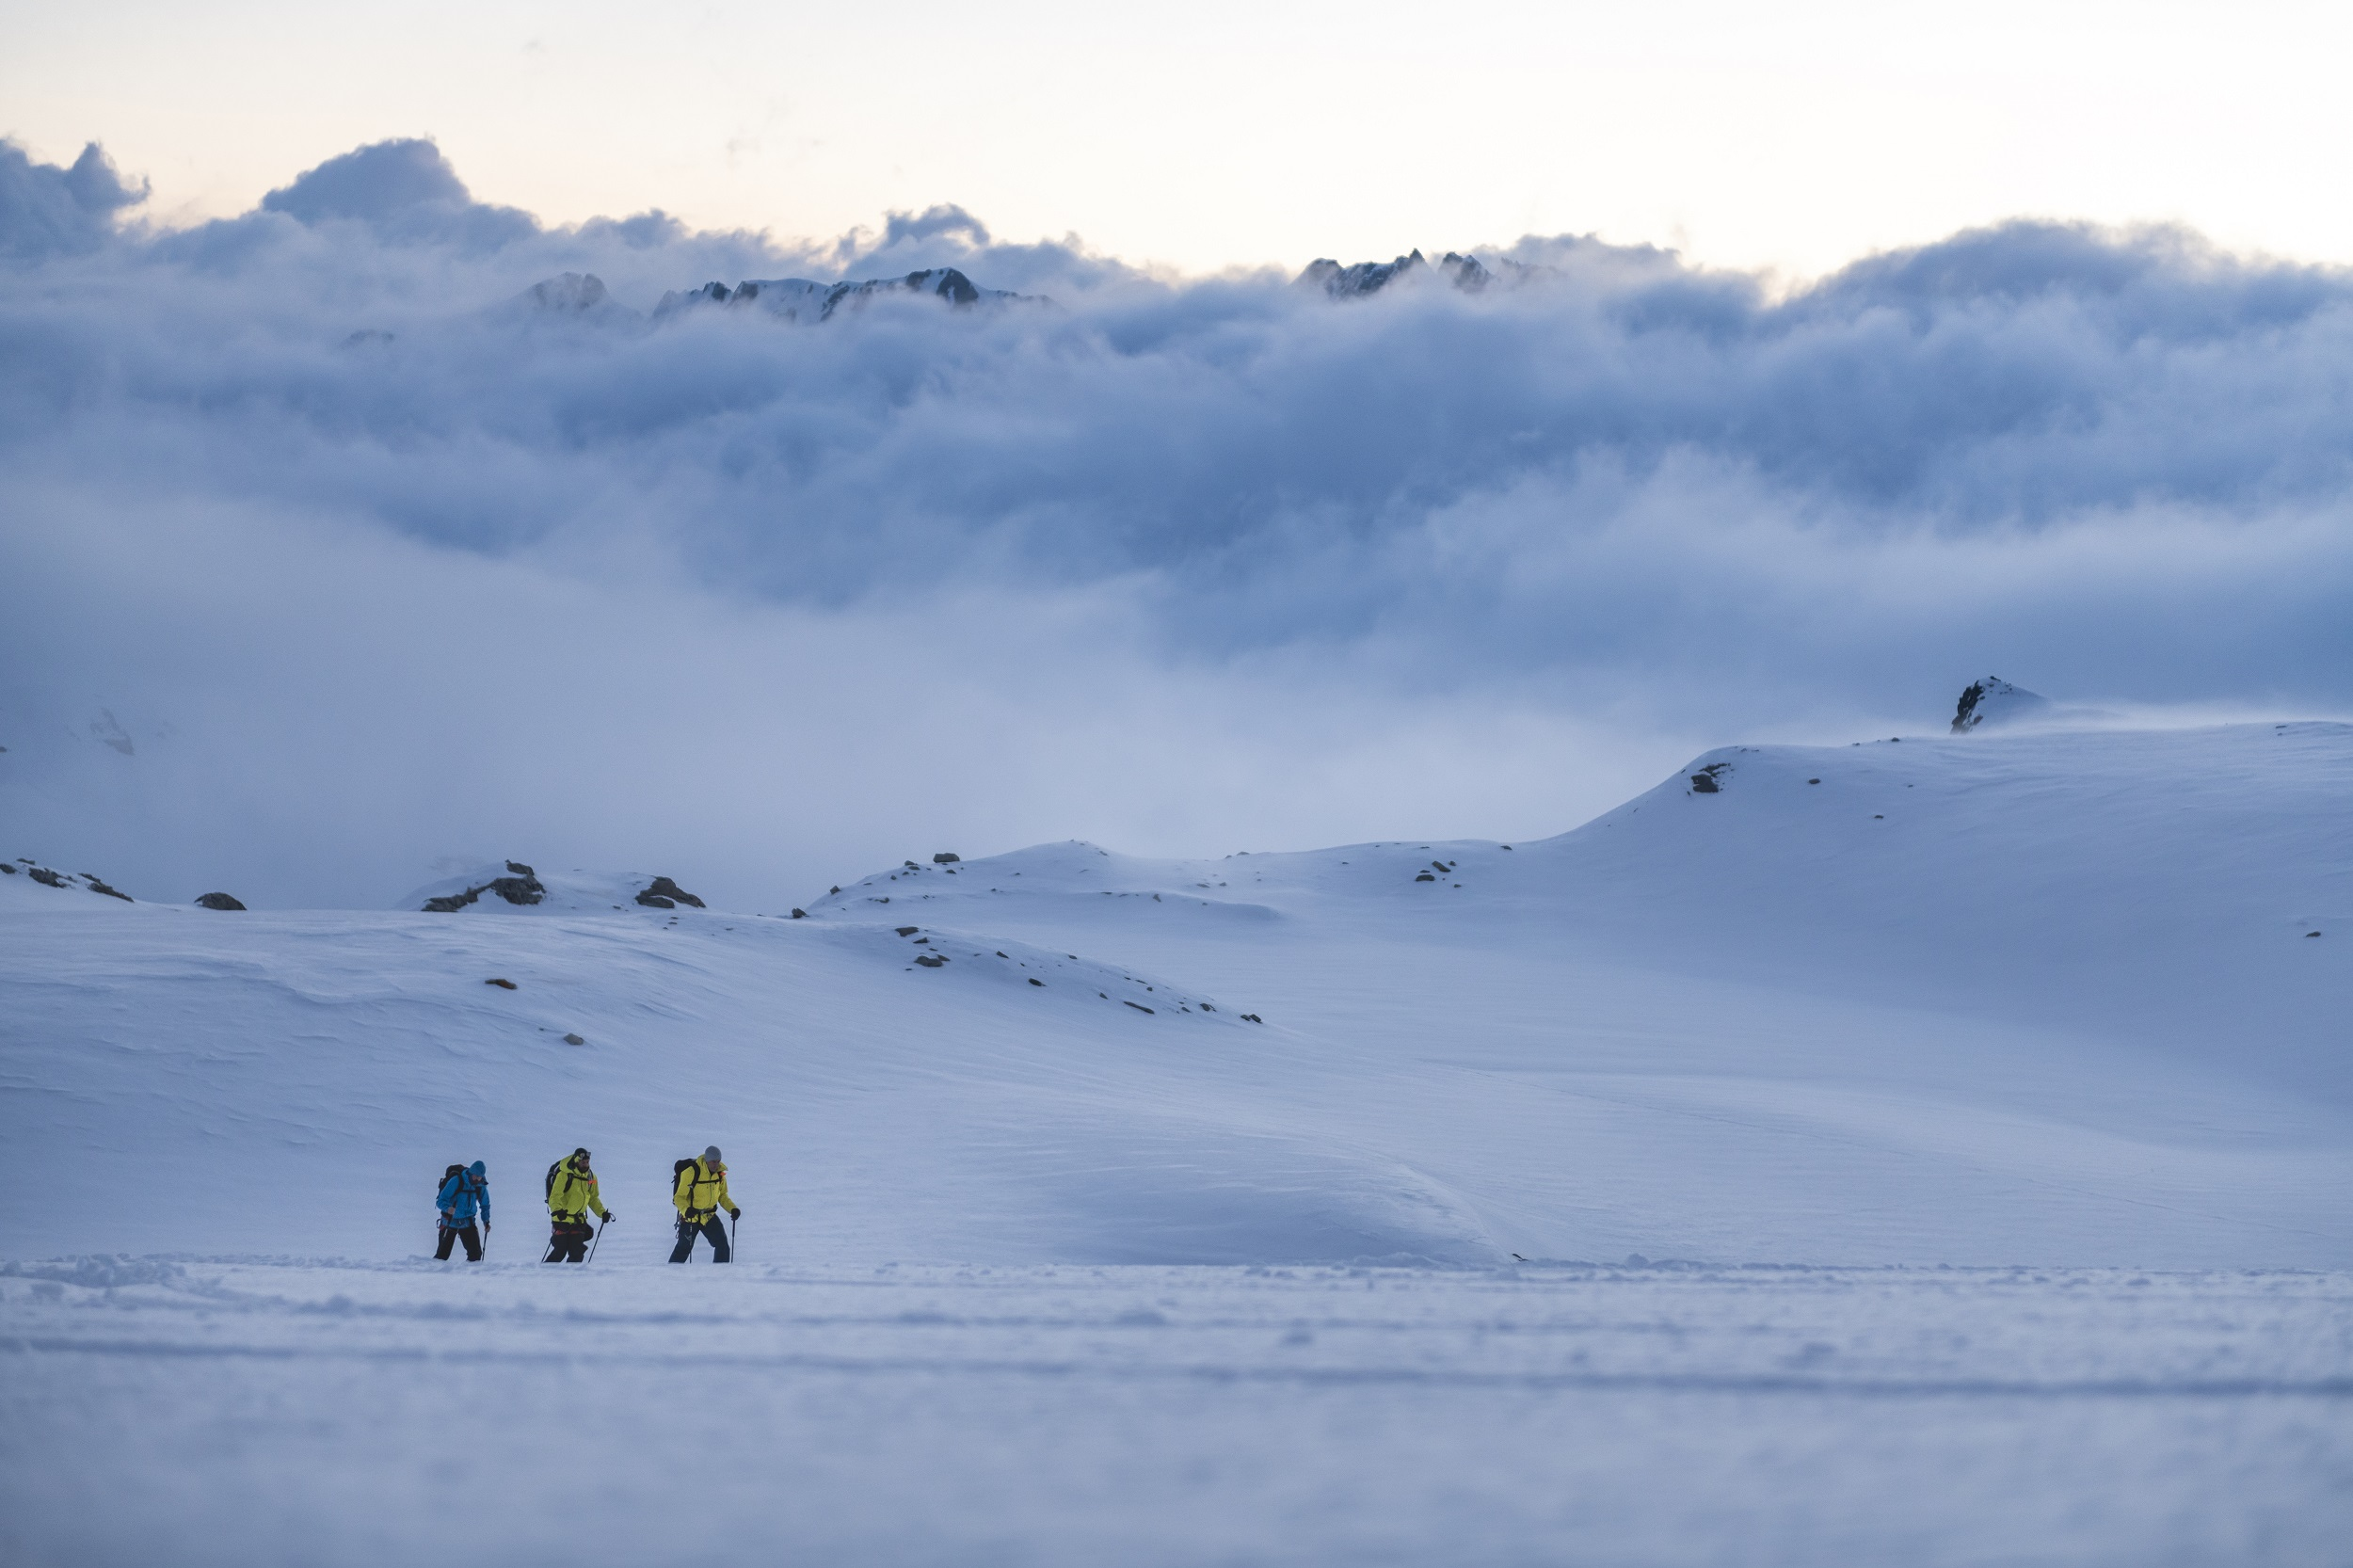 Wienwasserengletscher, Skitourengruppe